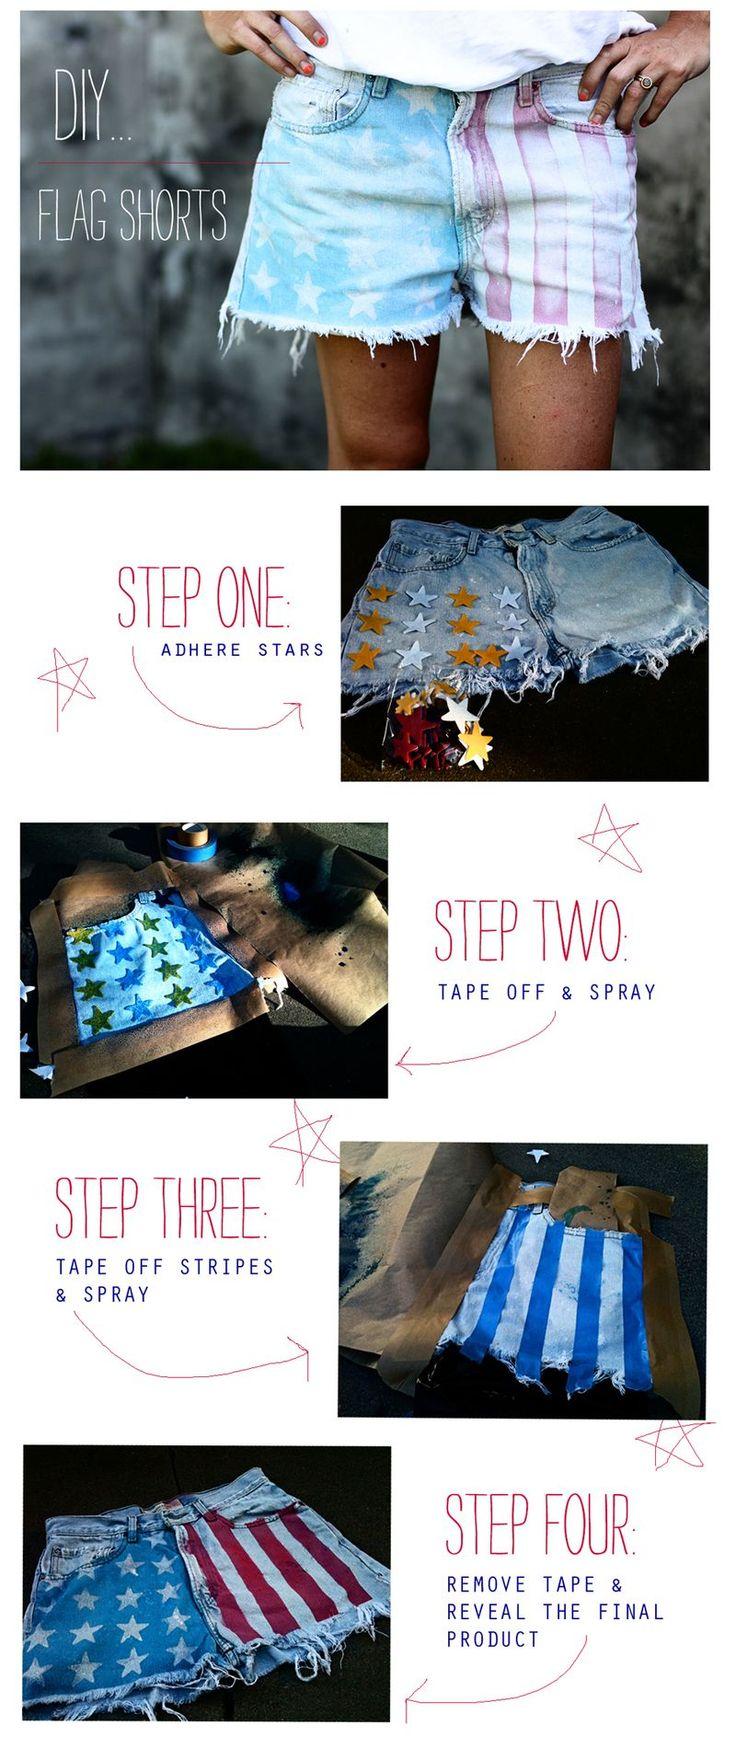 DIY American Flag ShortsDiy Flags, Ideas, American Flags Shorts Diy, Crafty, Clothing, Fourth Of July, 4Th Of July, Jeans Shorts, Crafts